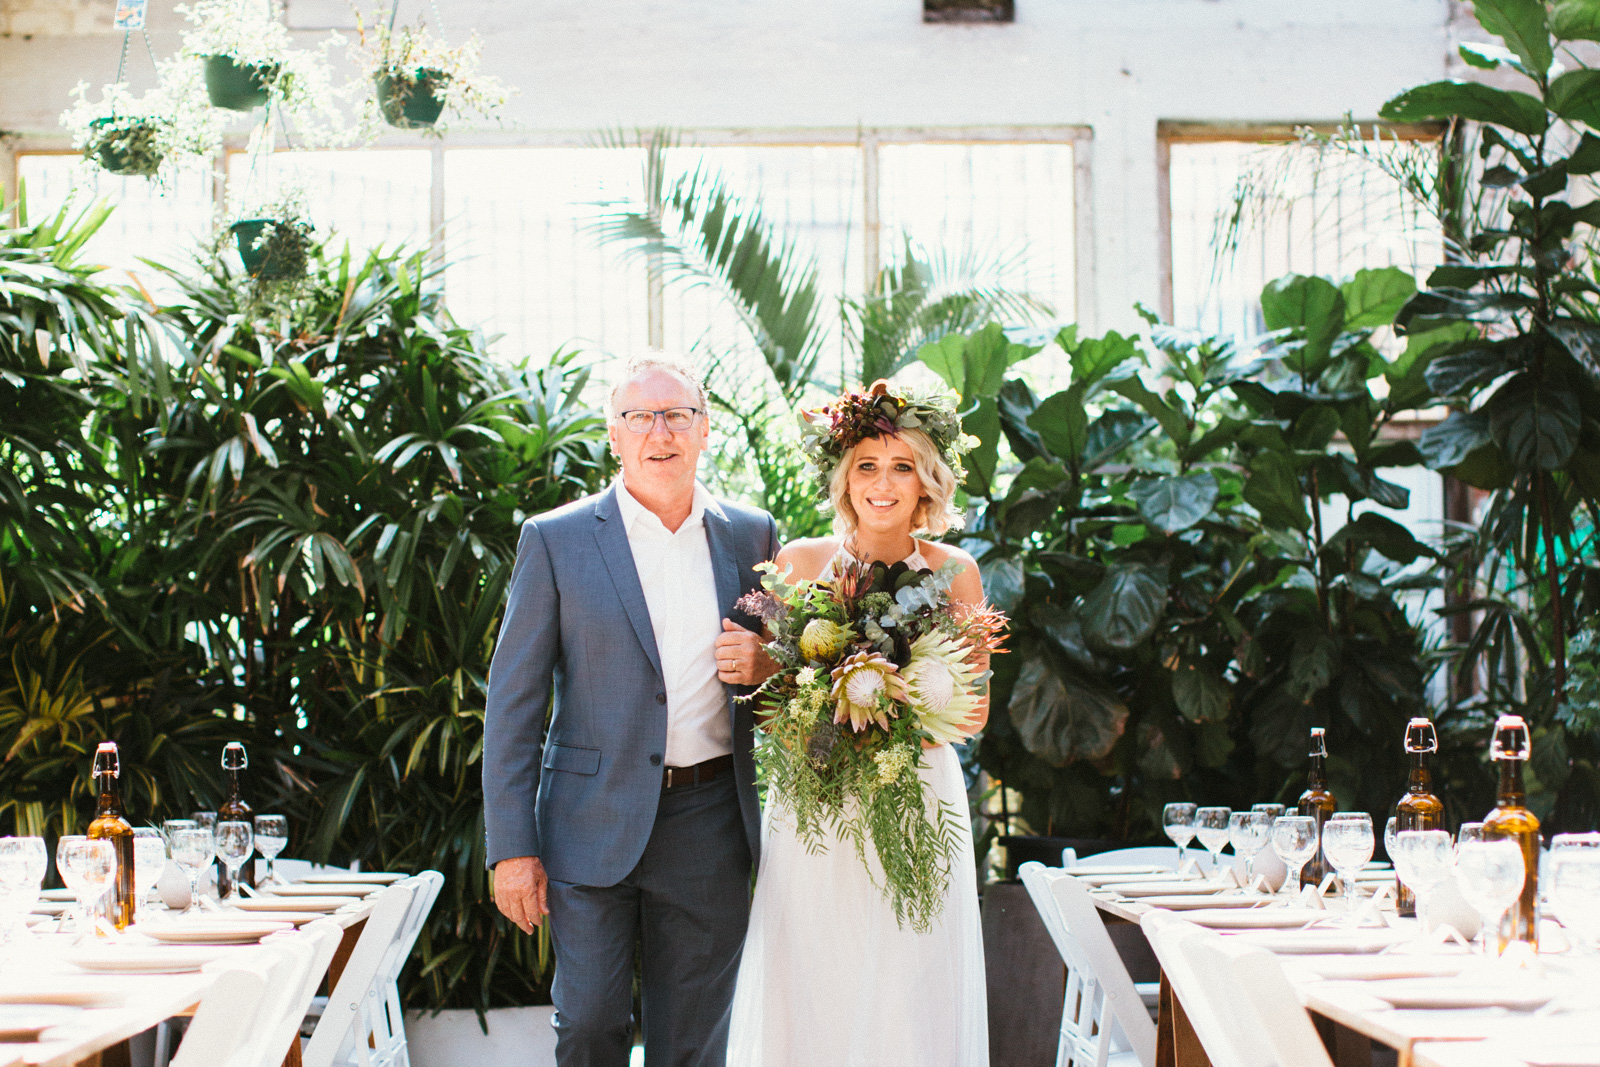 D+S-Melbourne Wedding Photographer-Glasshaus-Dean Raphael-65.jpg